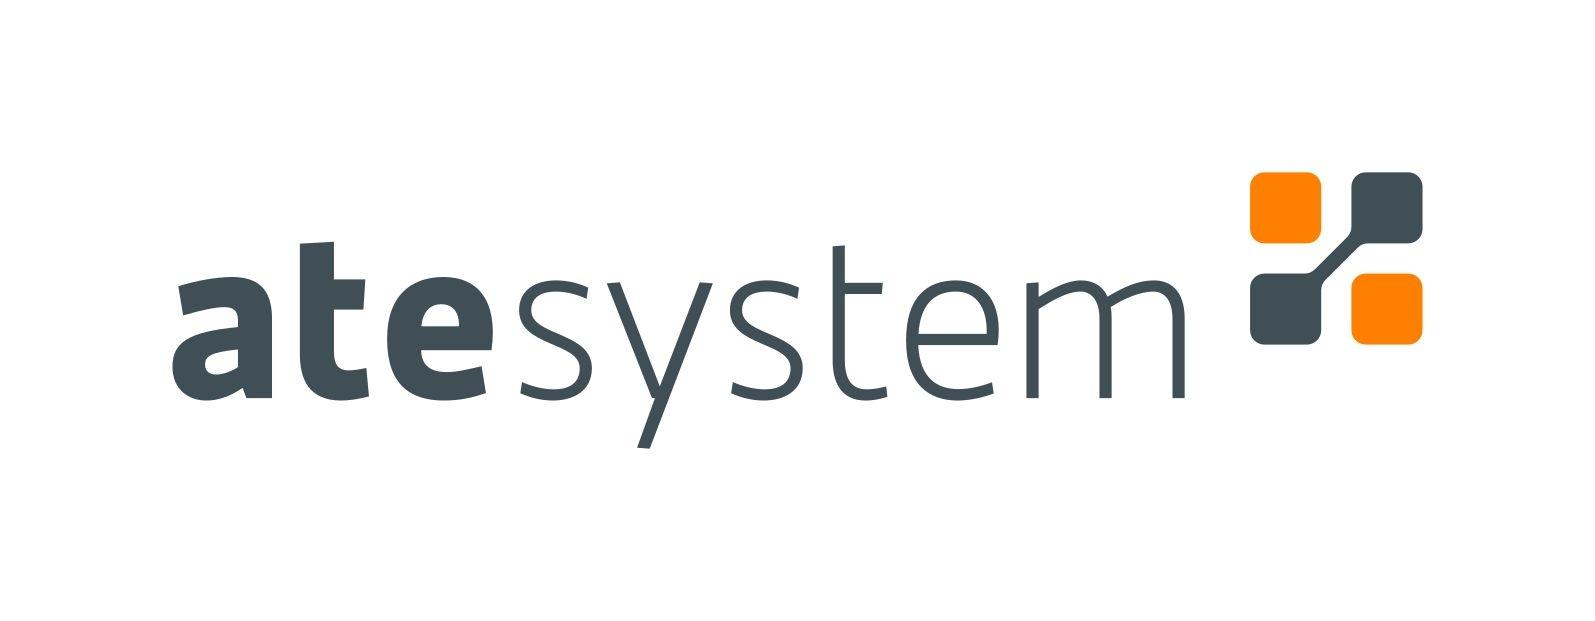 ATEsystem s.r.o.